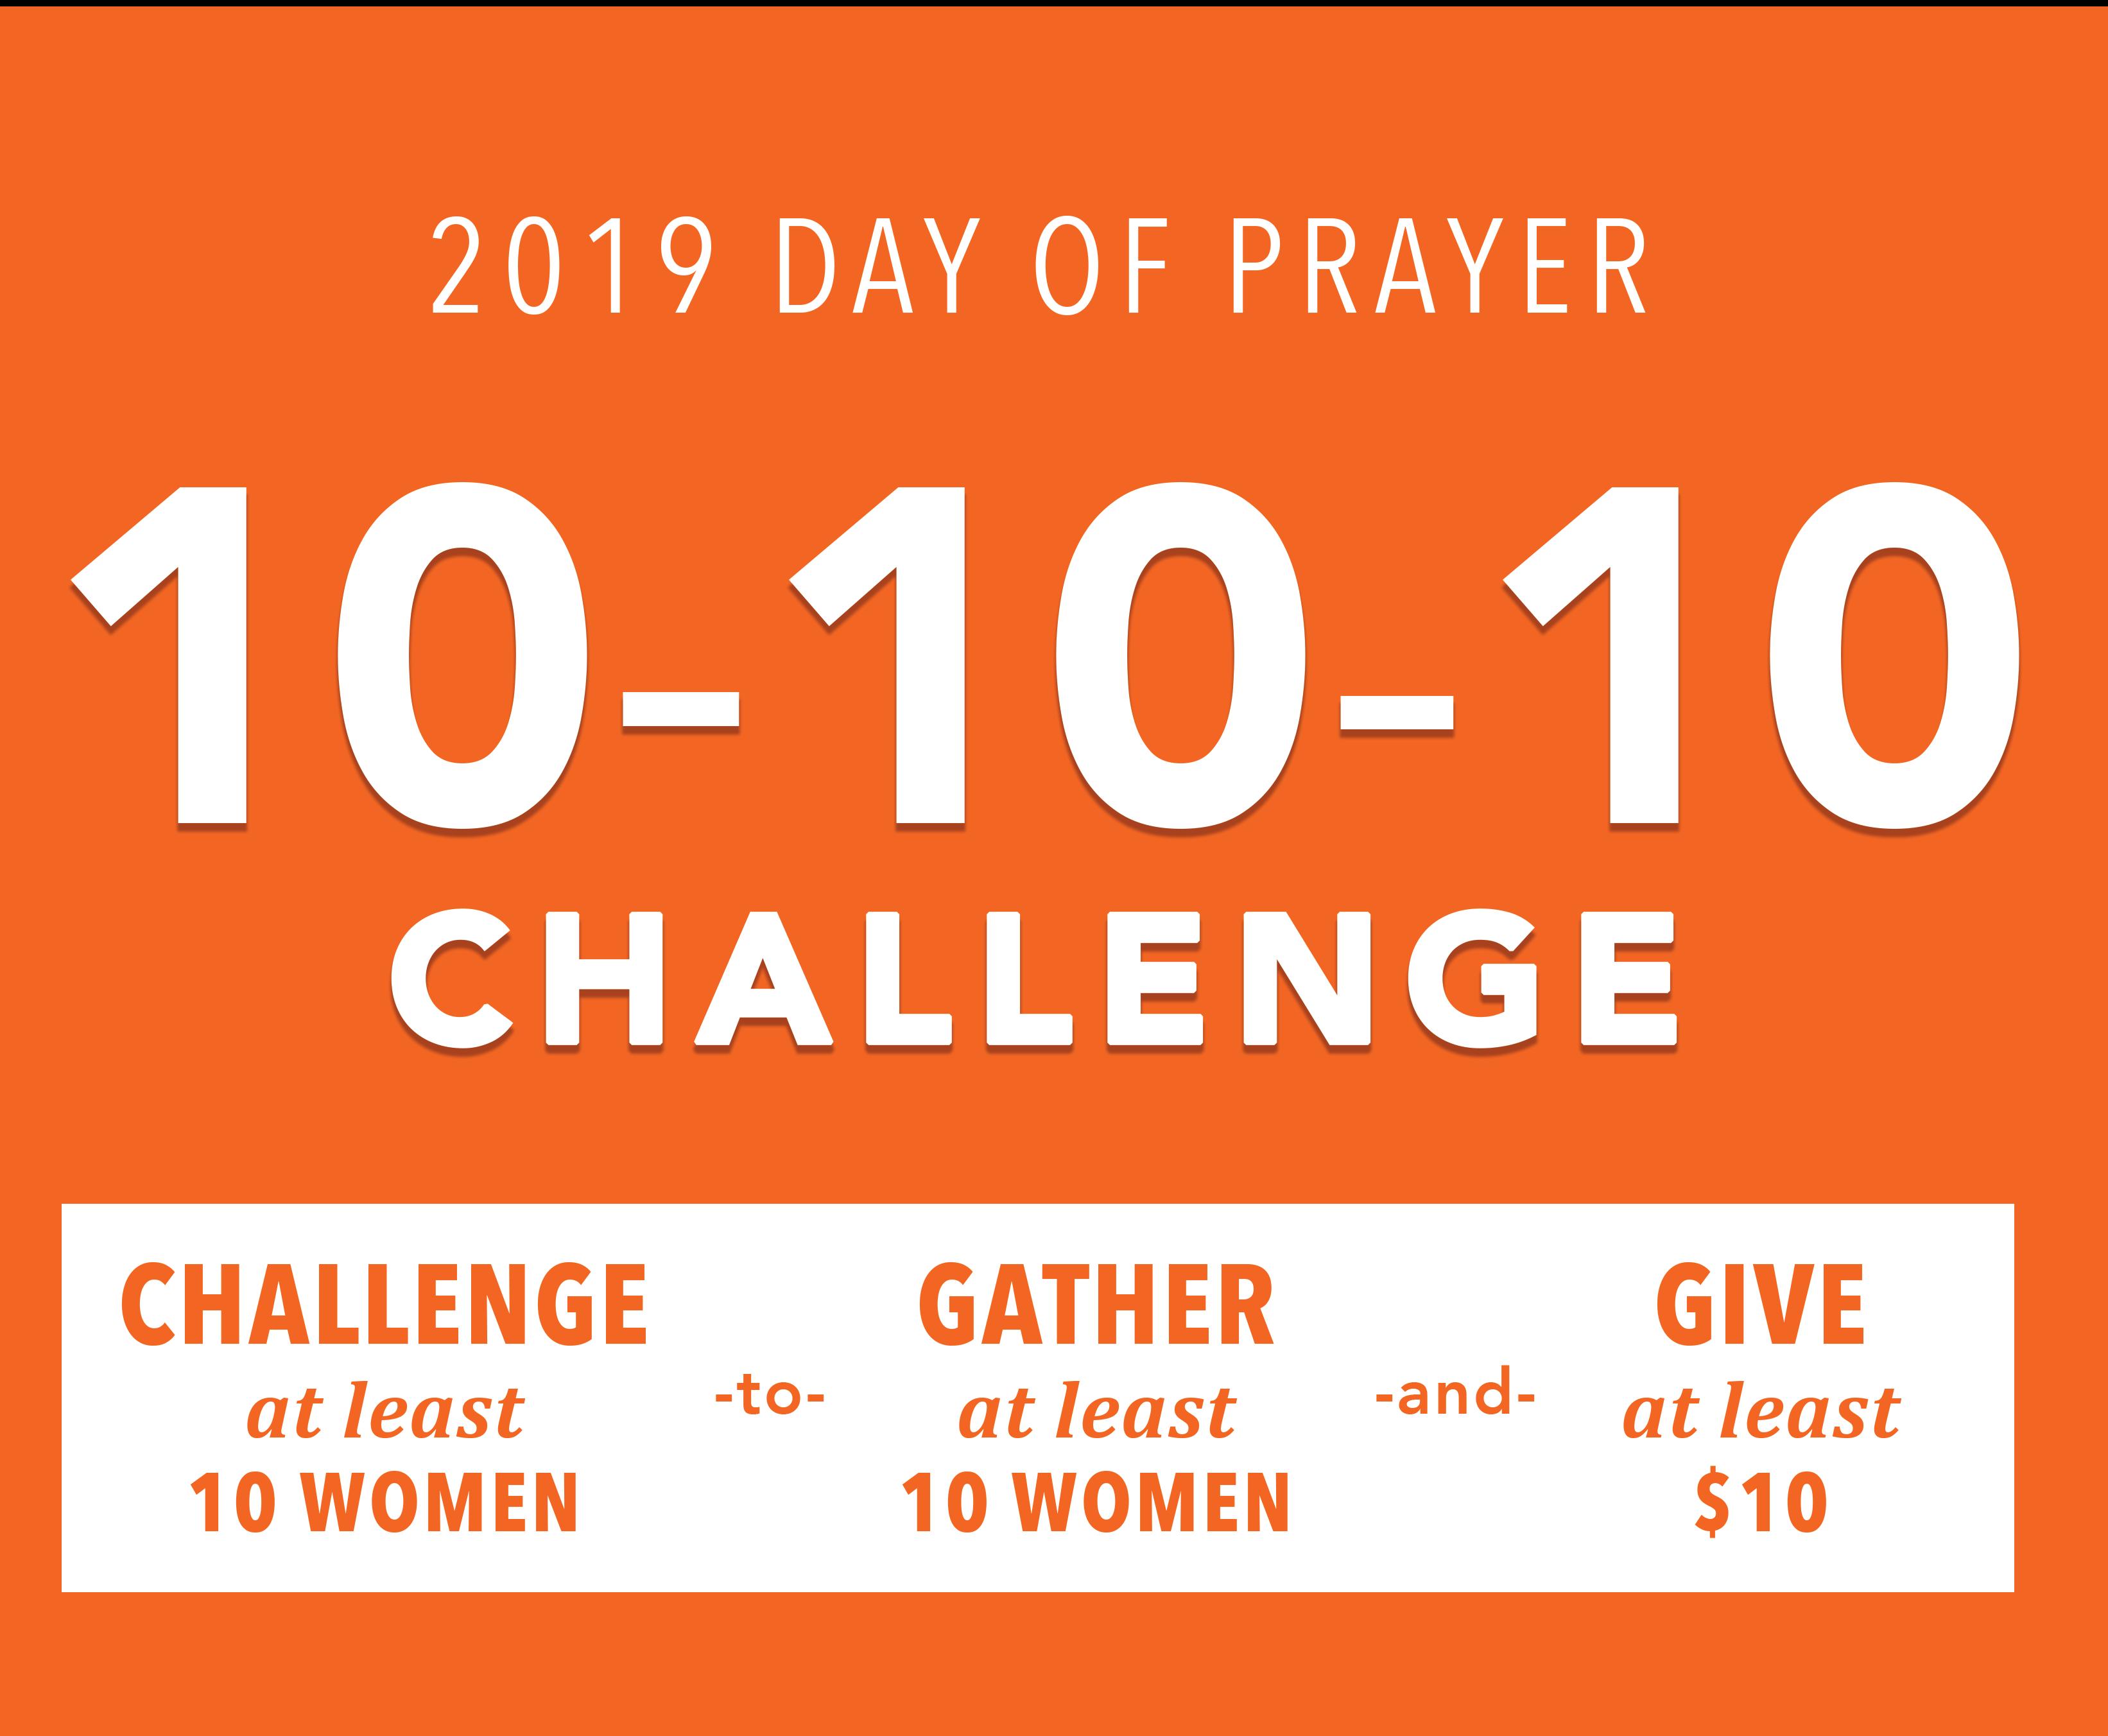 2019 Day of Prayer Challenge